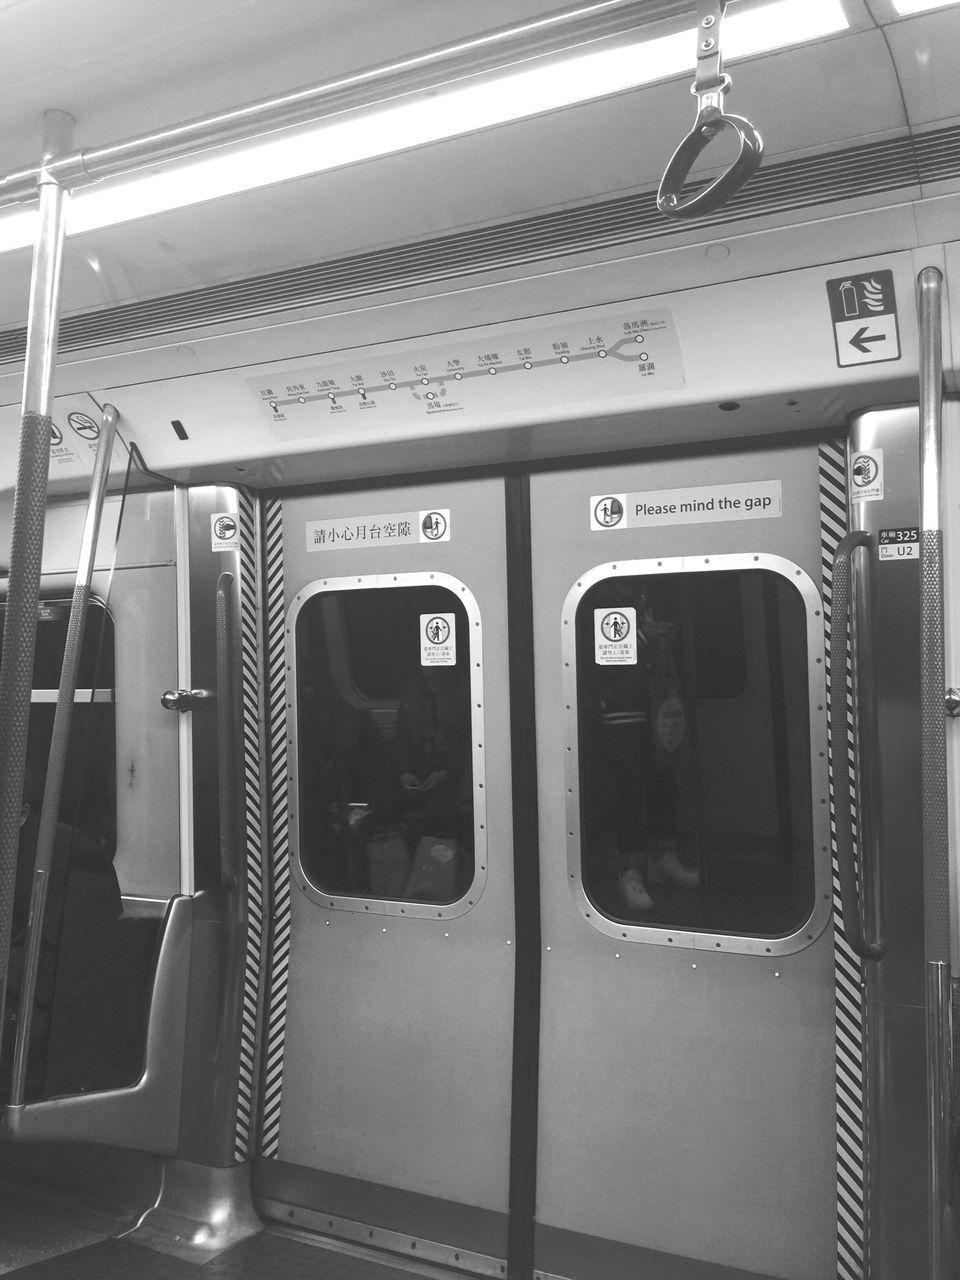 train - vehicle, public transportation, rail transportation, transportation, no people, indoors, subway train, illuminated, day